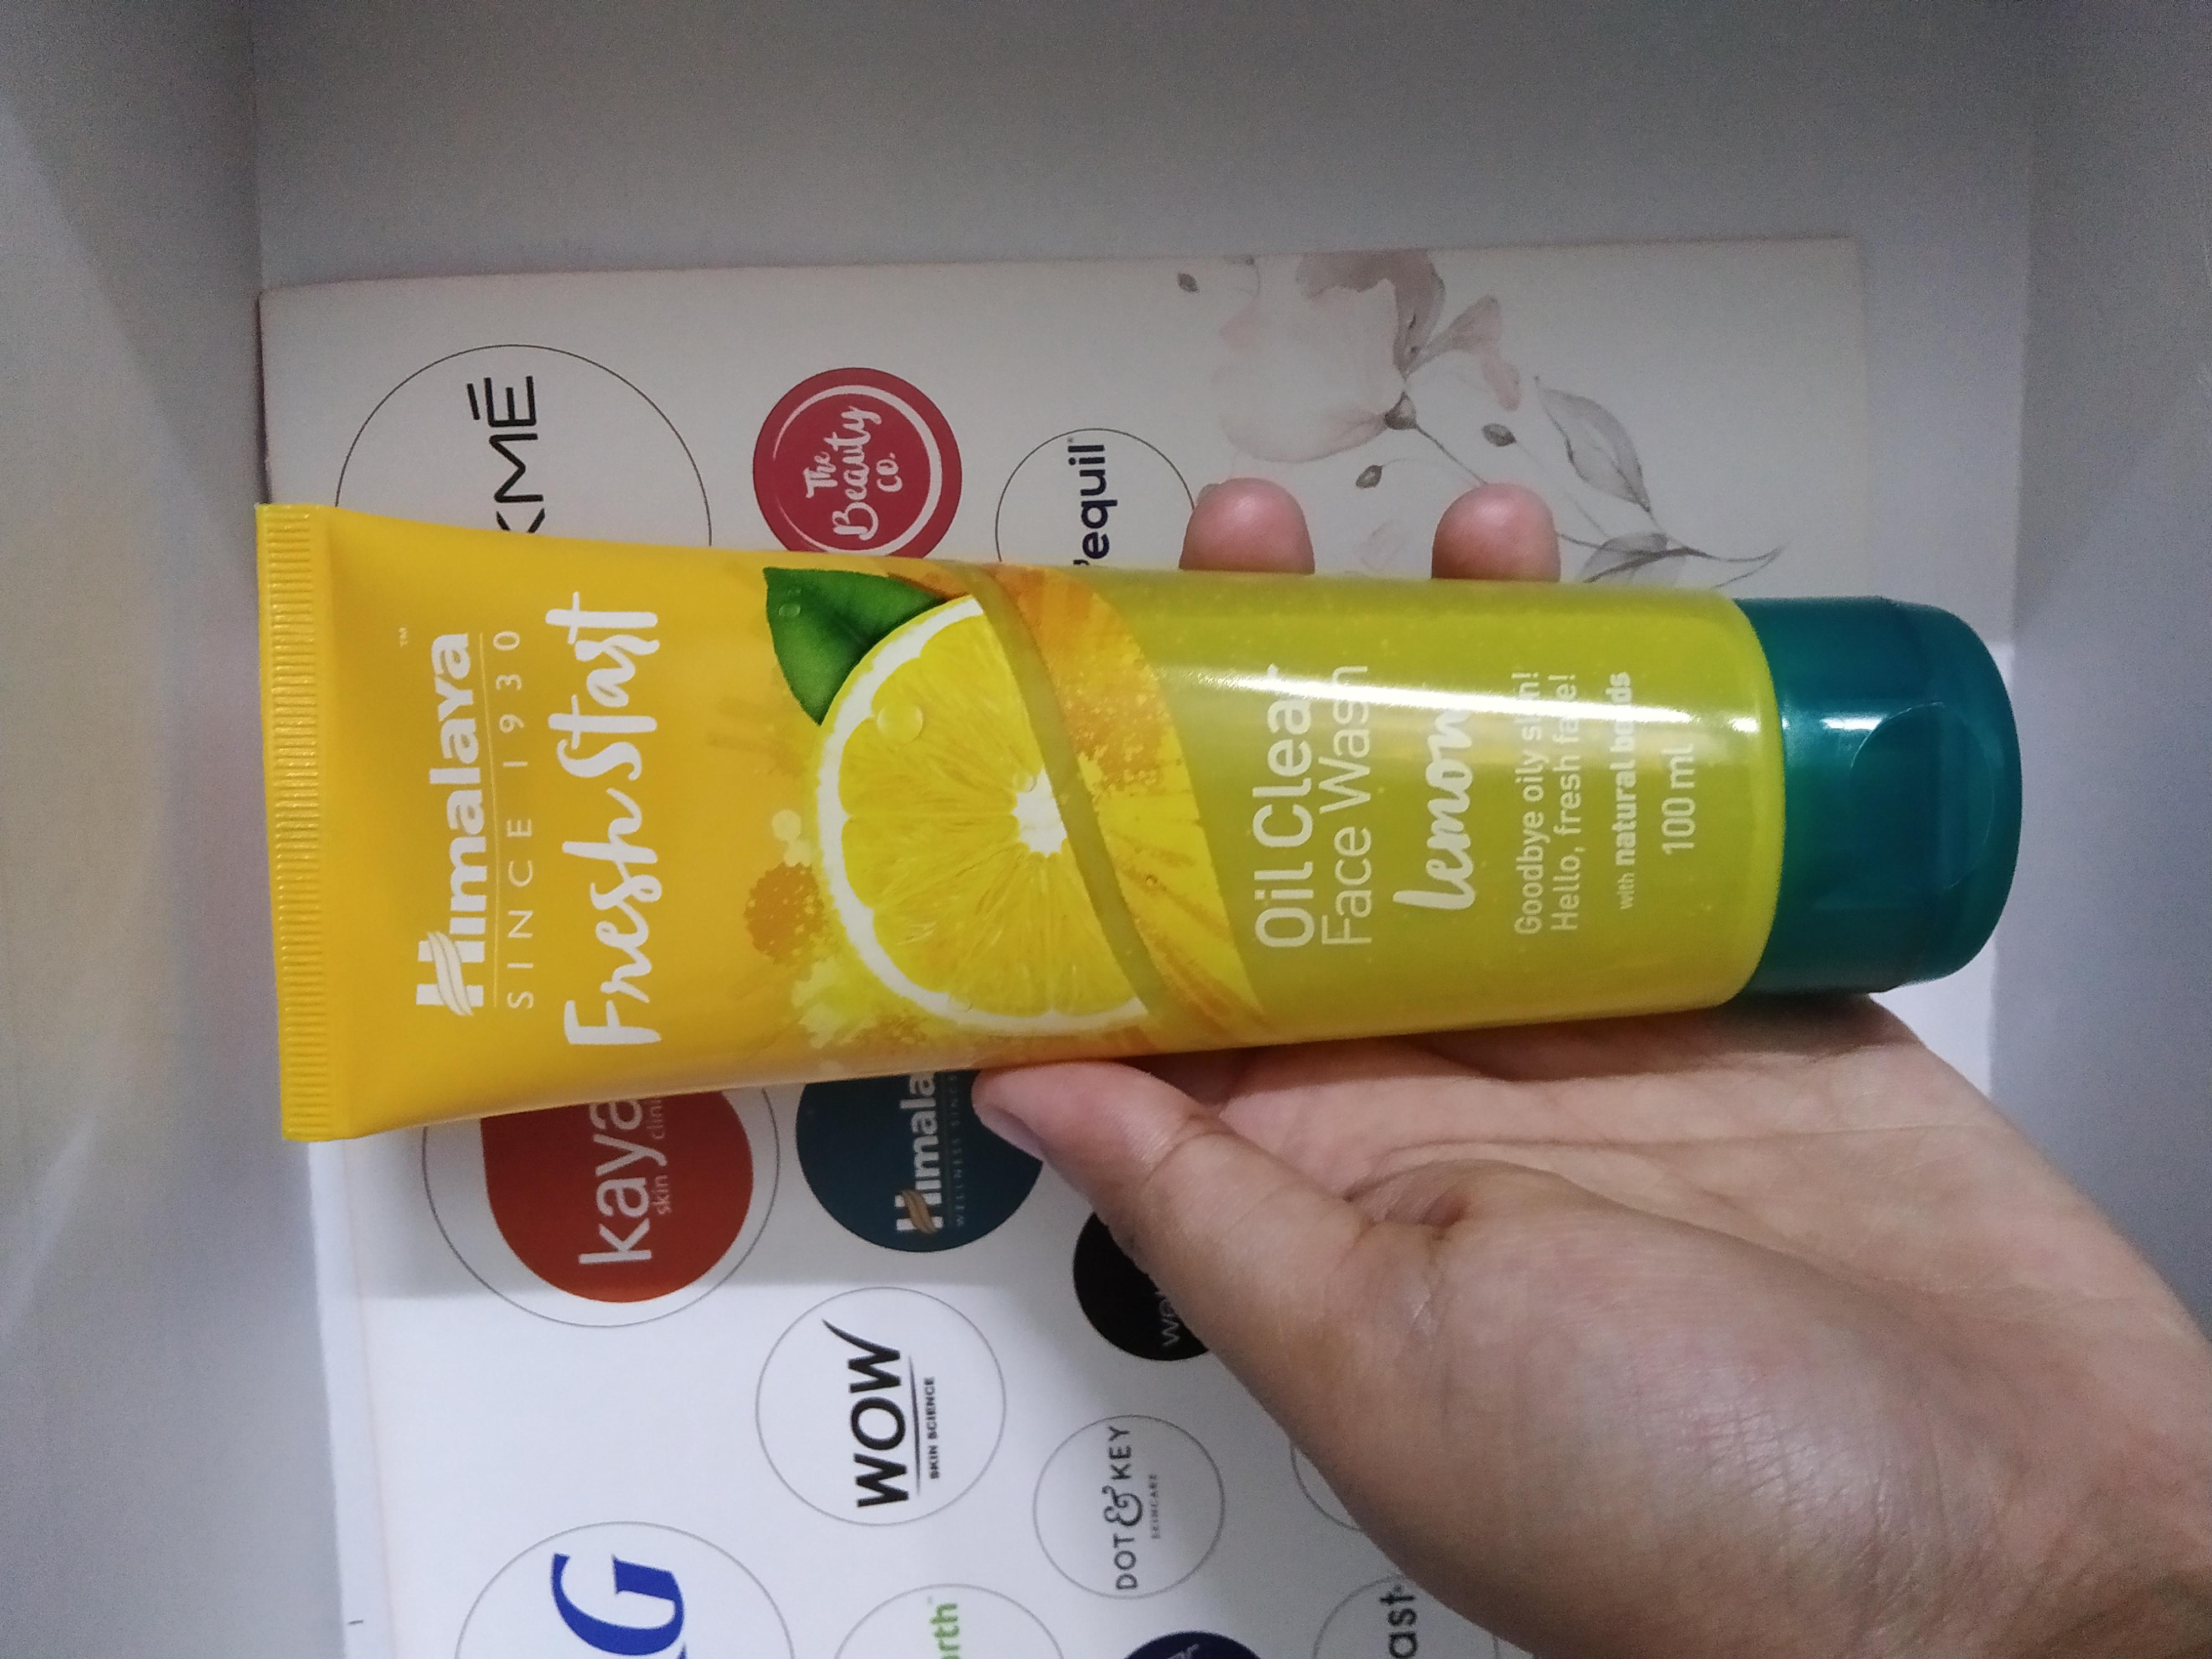 Himalaya Herbals Fresh Start Oil Clear Lemon Face Wash-Feels refreshing-By sukanya_sarkar_vlogs